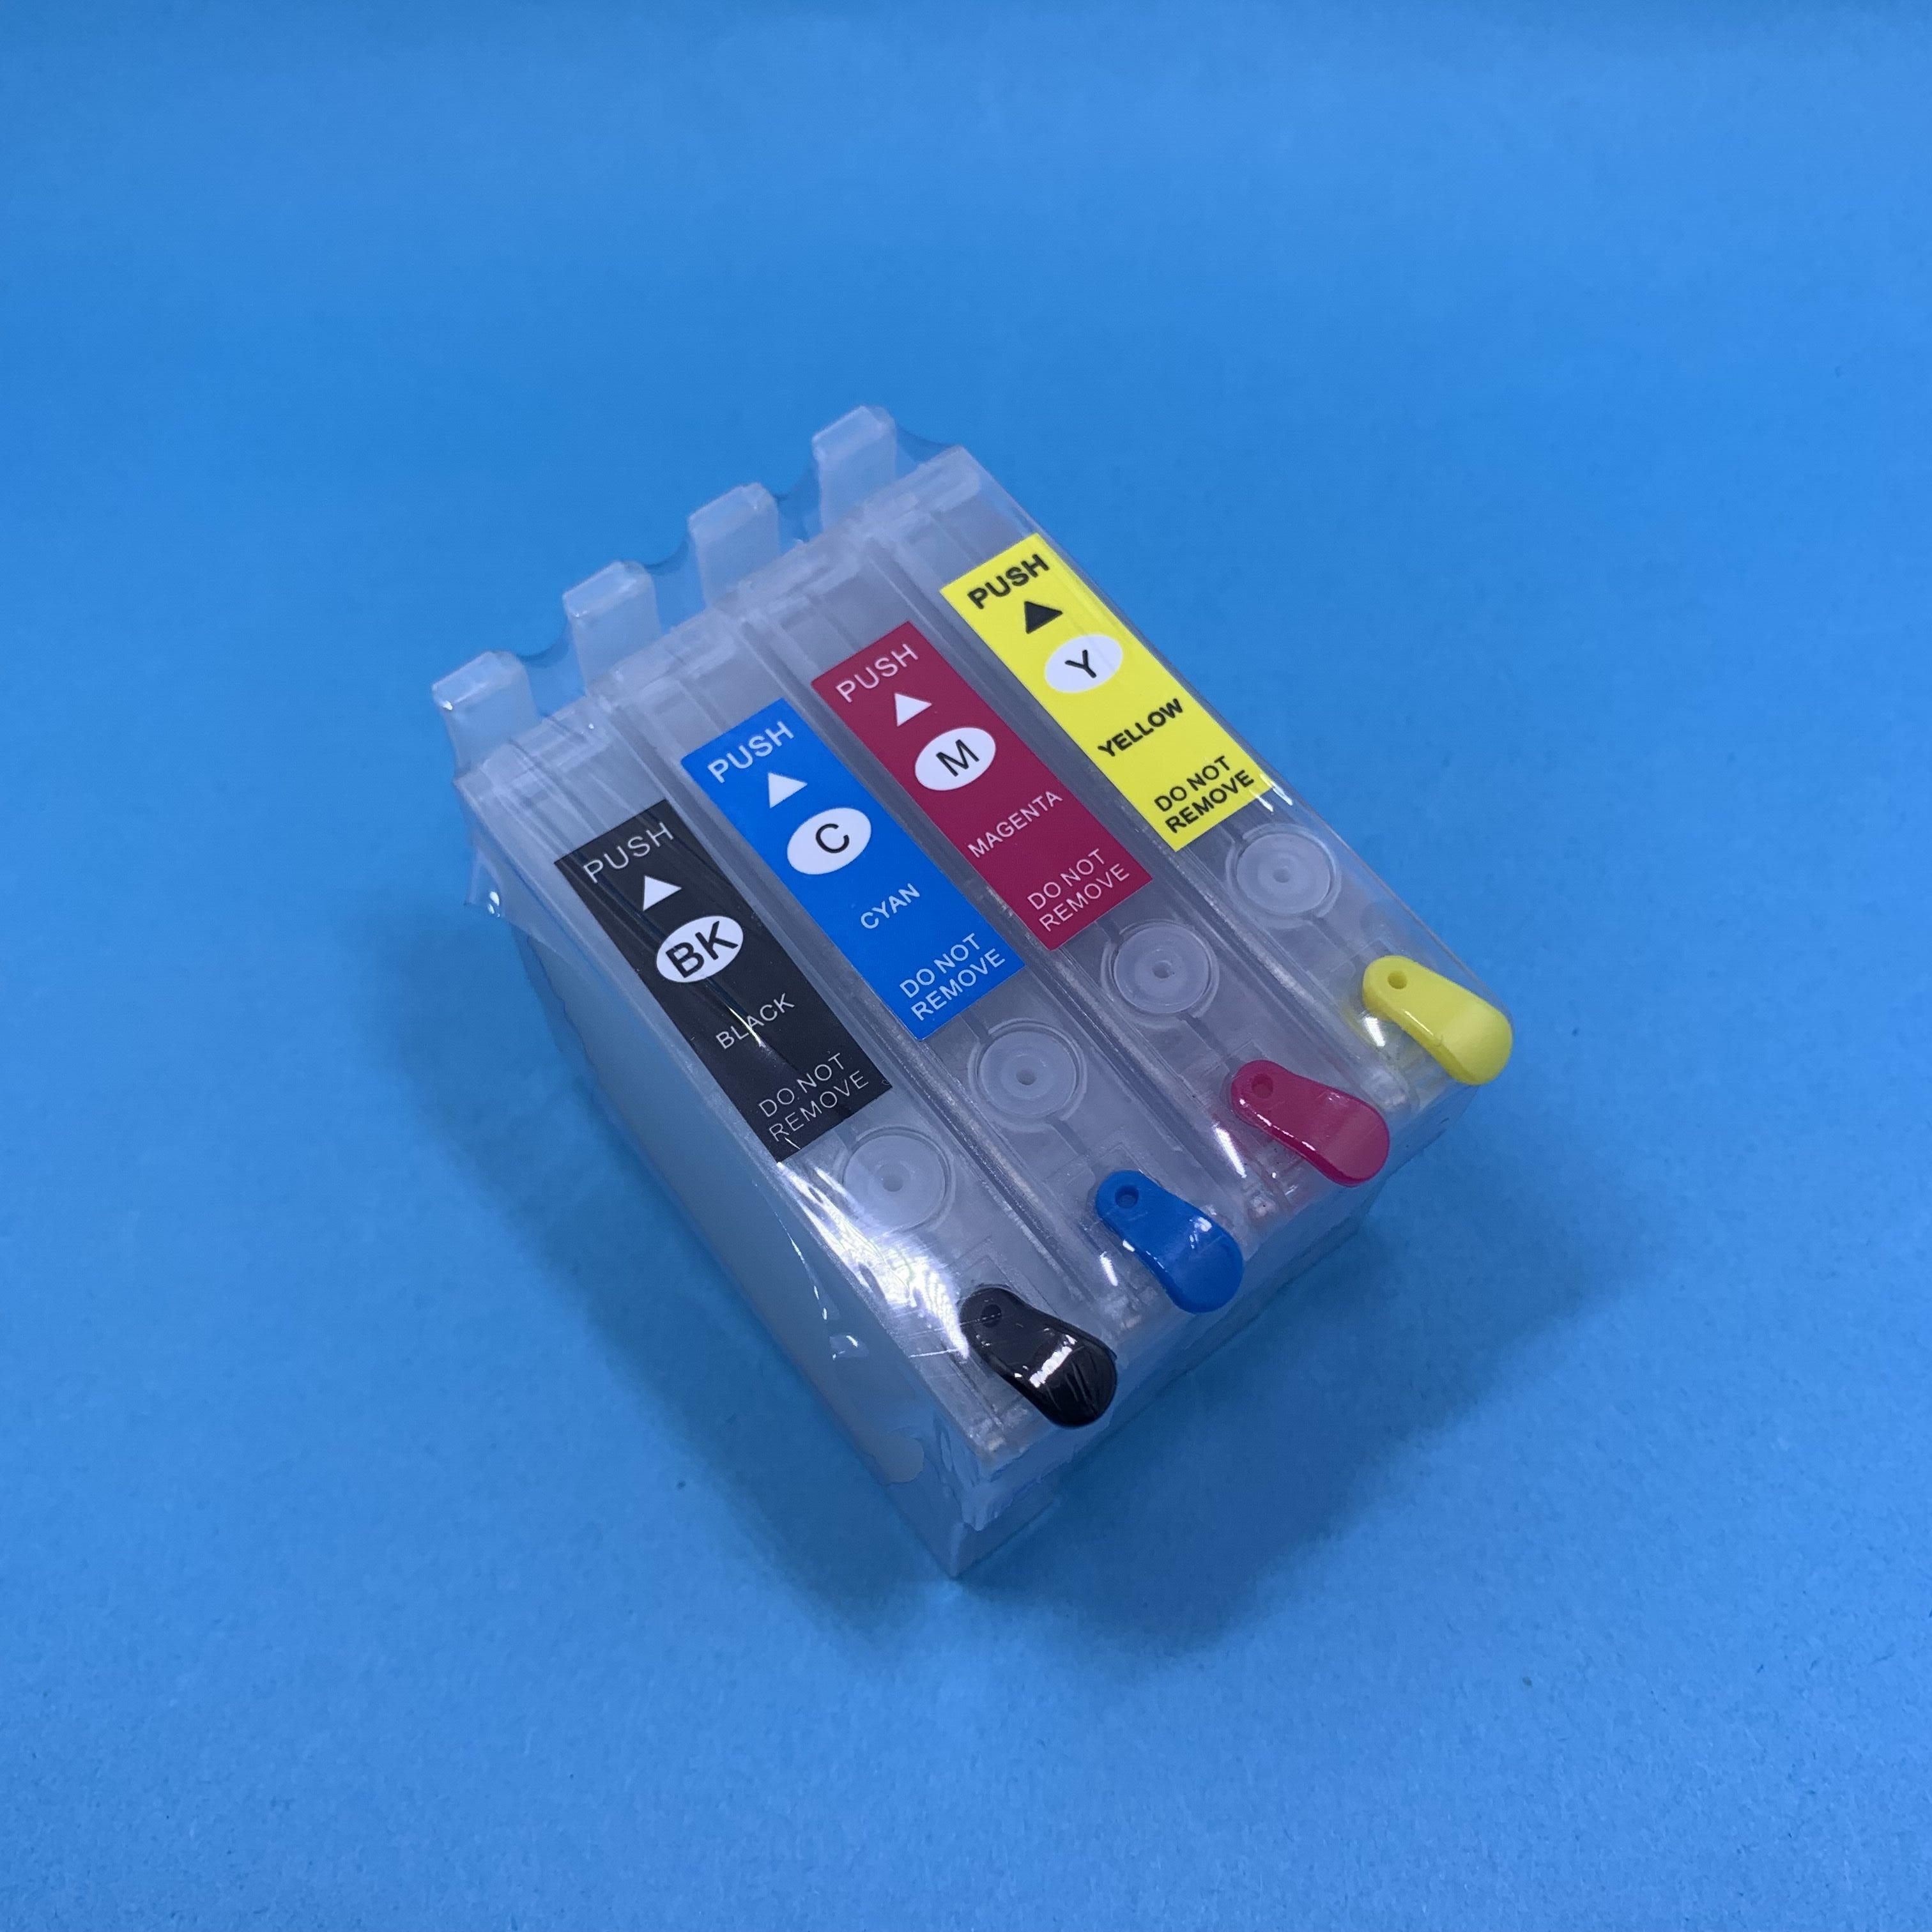 YOTAT пустой многоразовый чернильный картридж T1411 T1412 T1413 T1414 для Epson WorkForce WF-3521/Office 535 ME Office 570W 85ND 82WD